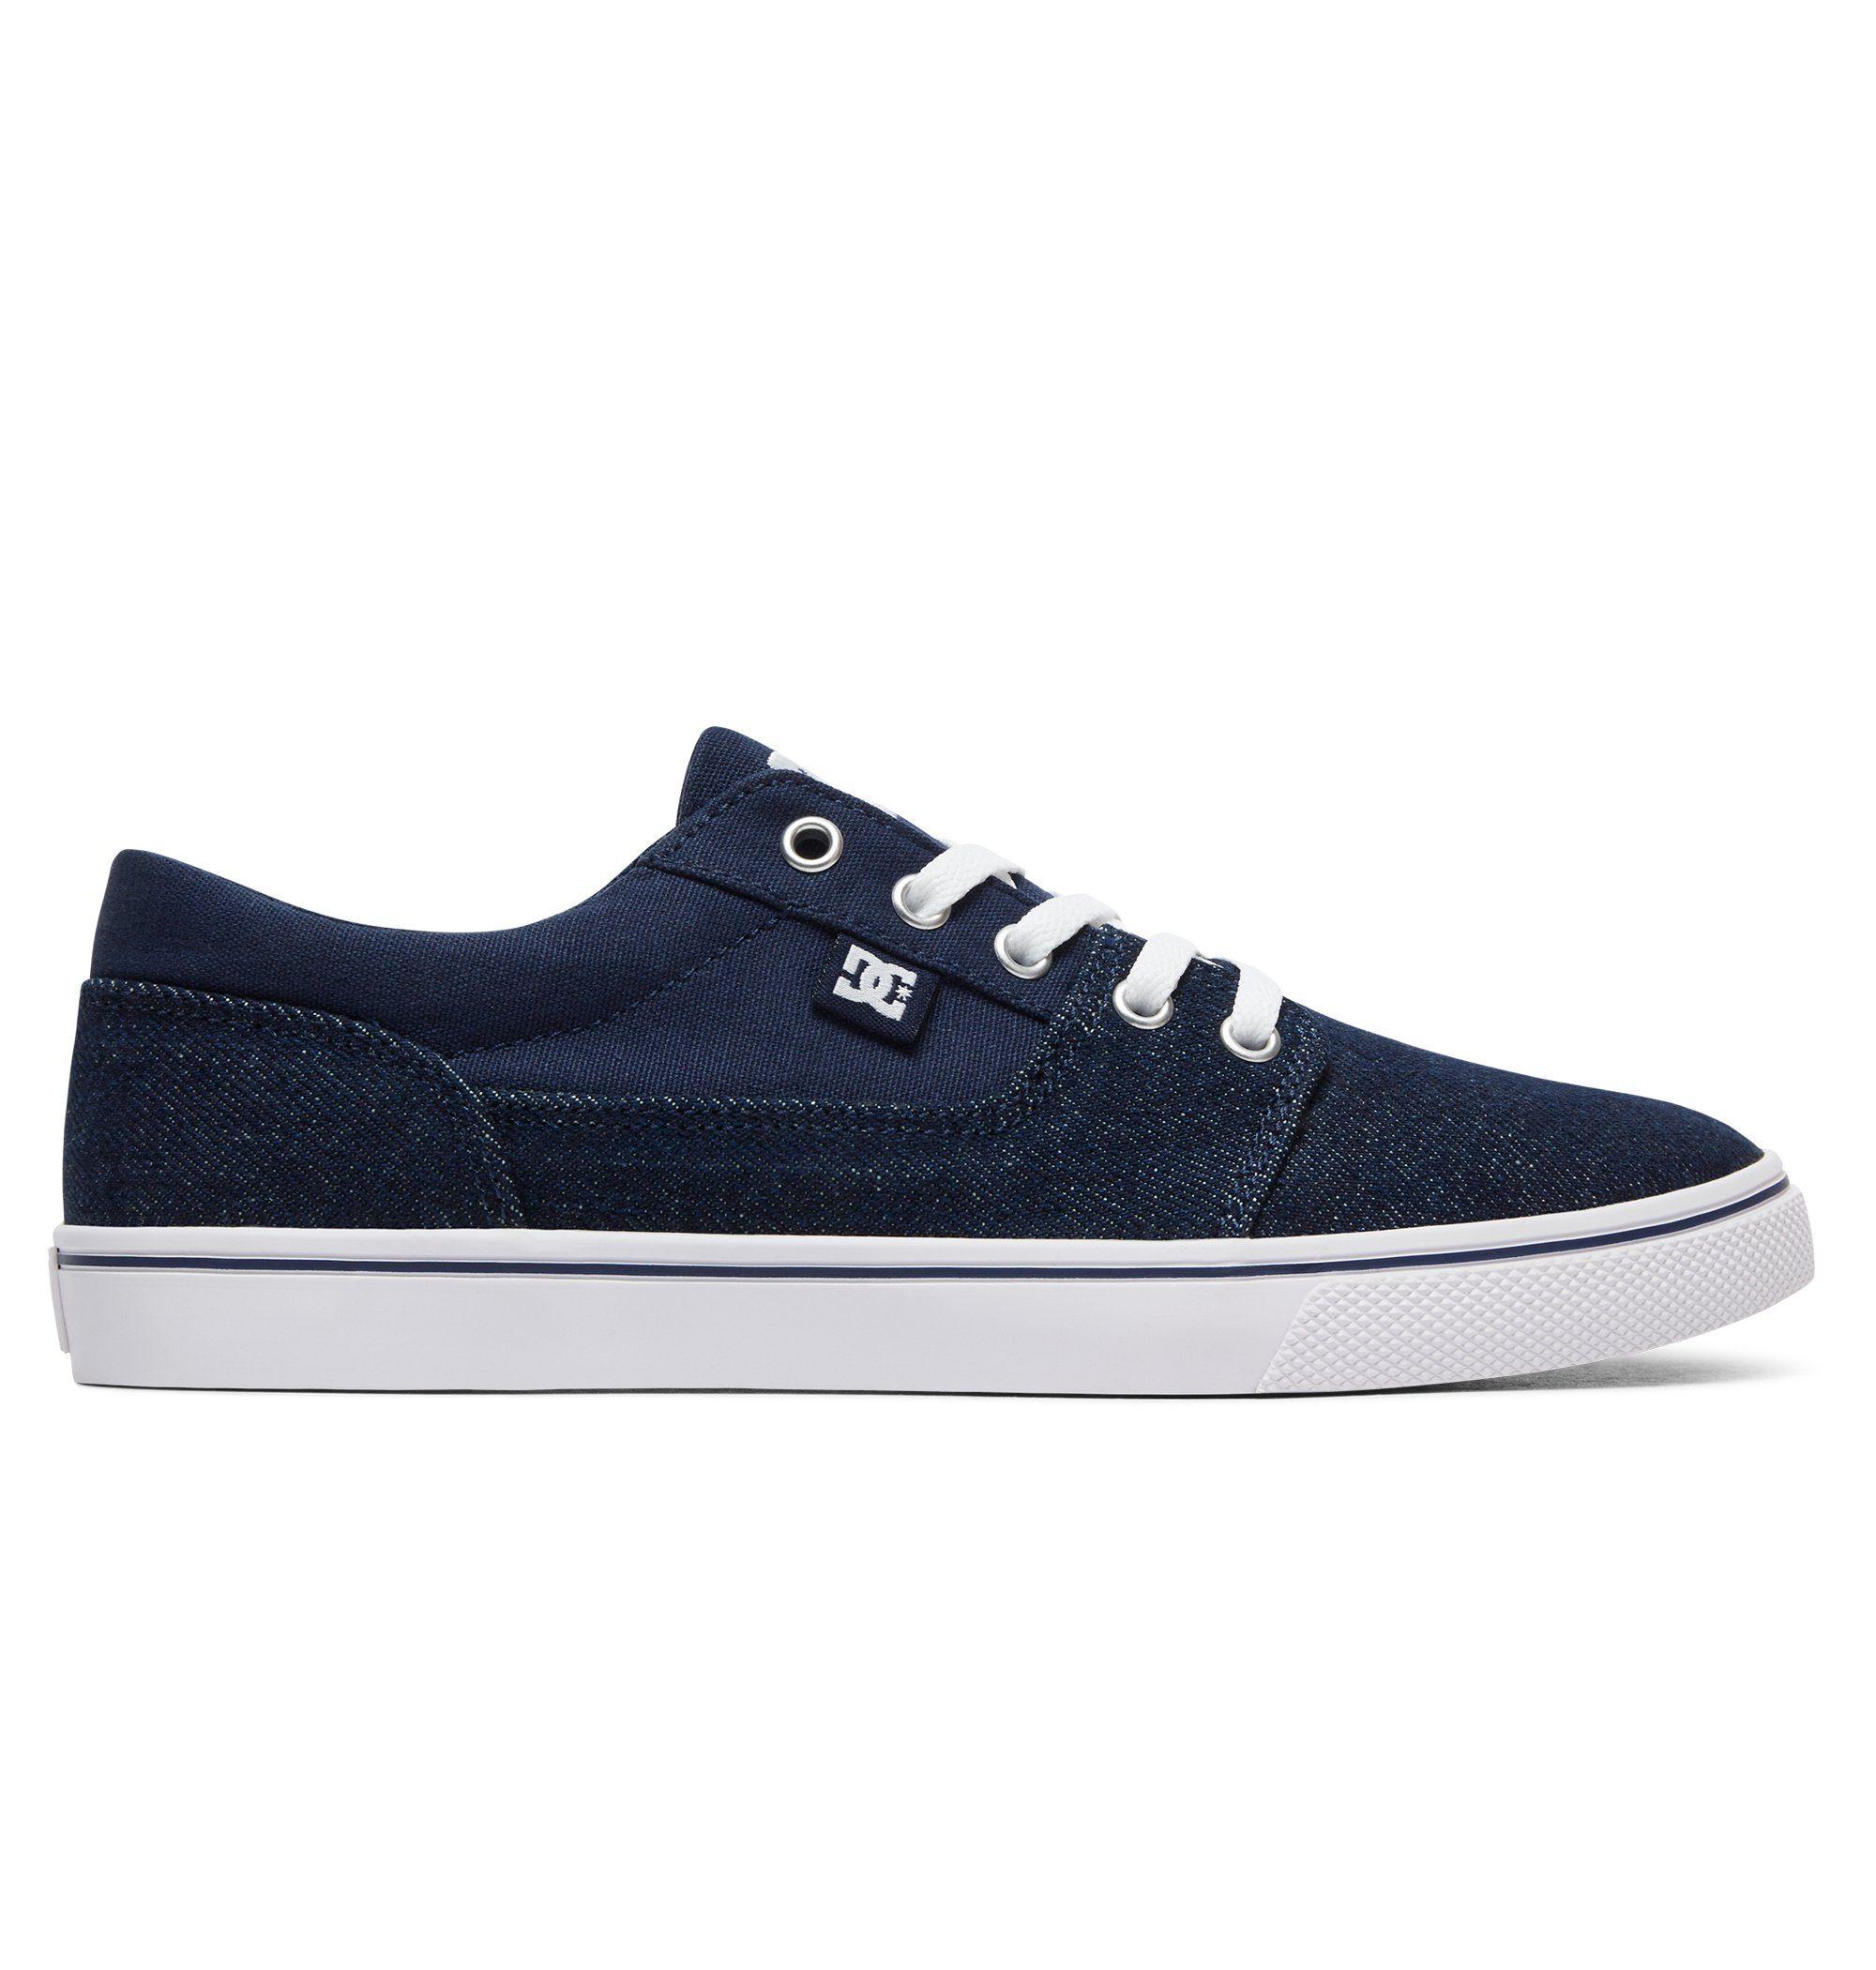 Dc Shoes Bleu Tonik Chaussures fYb3Mlg0